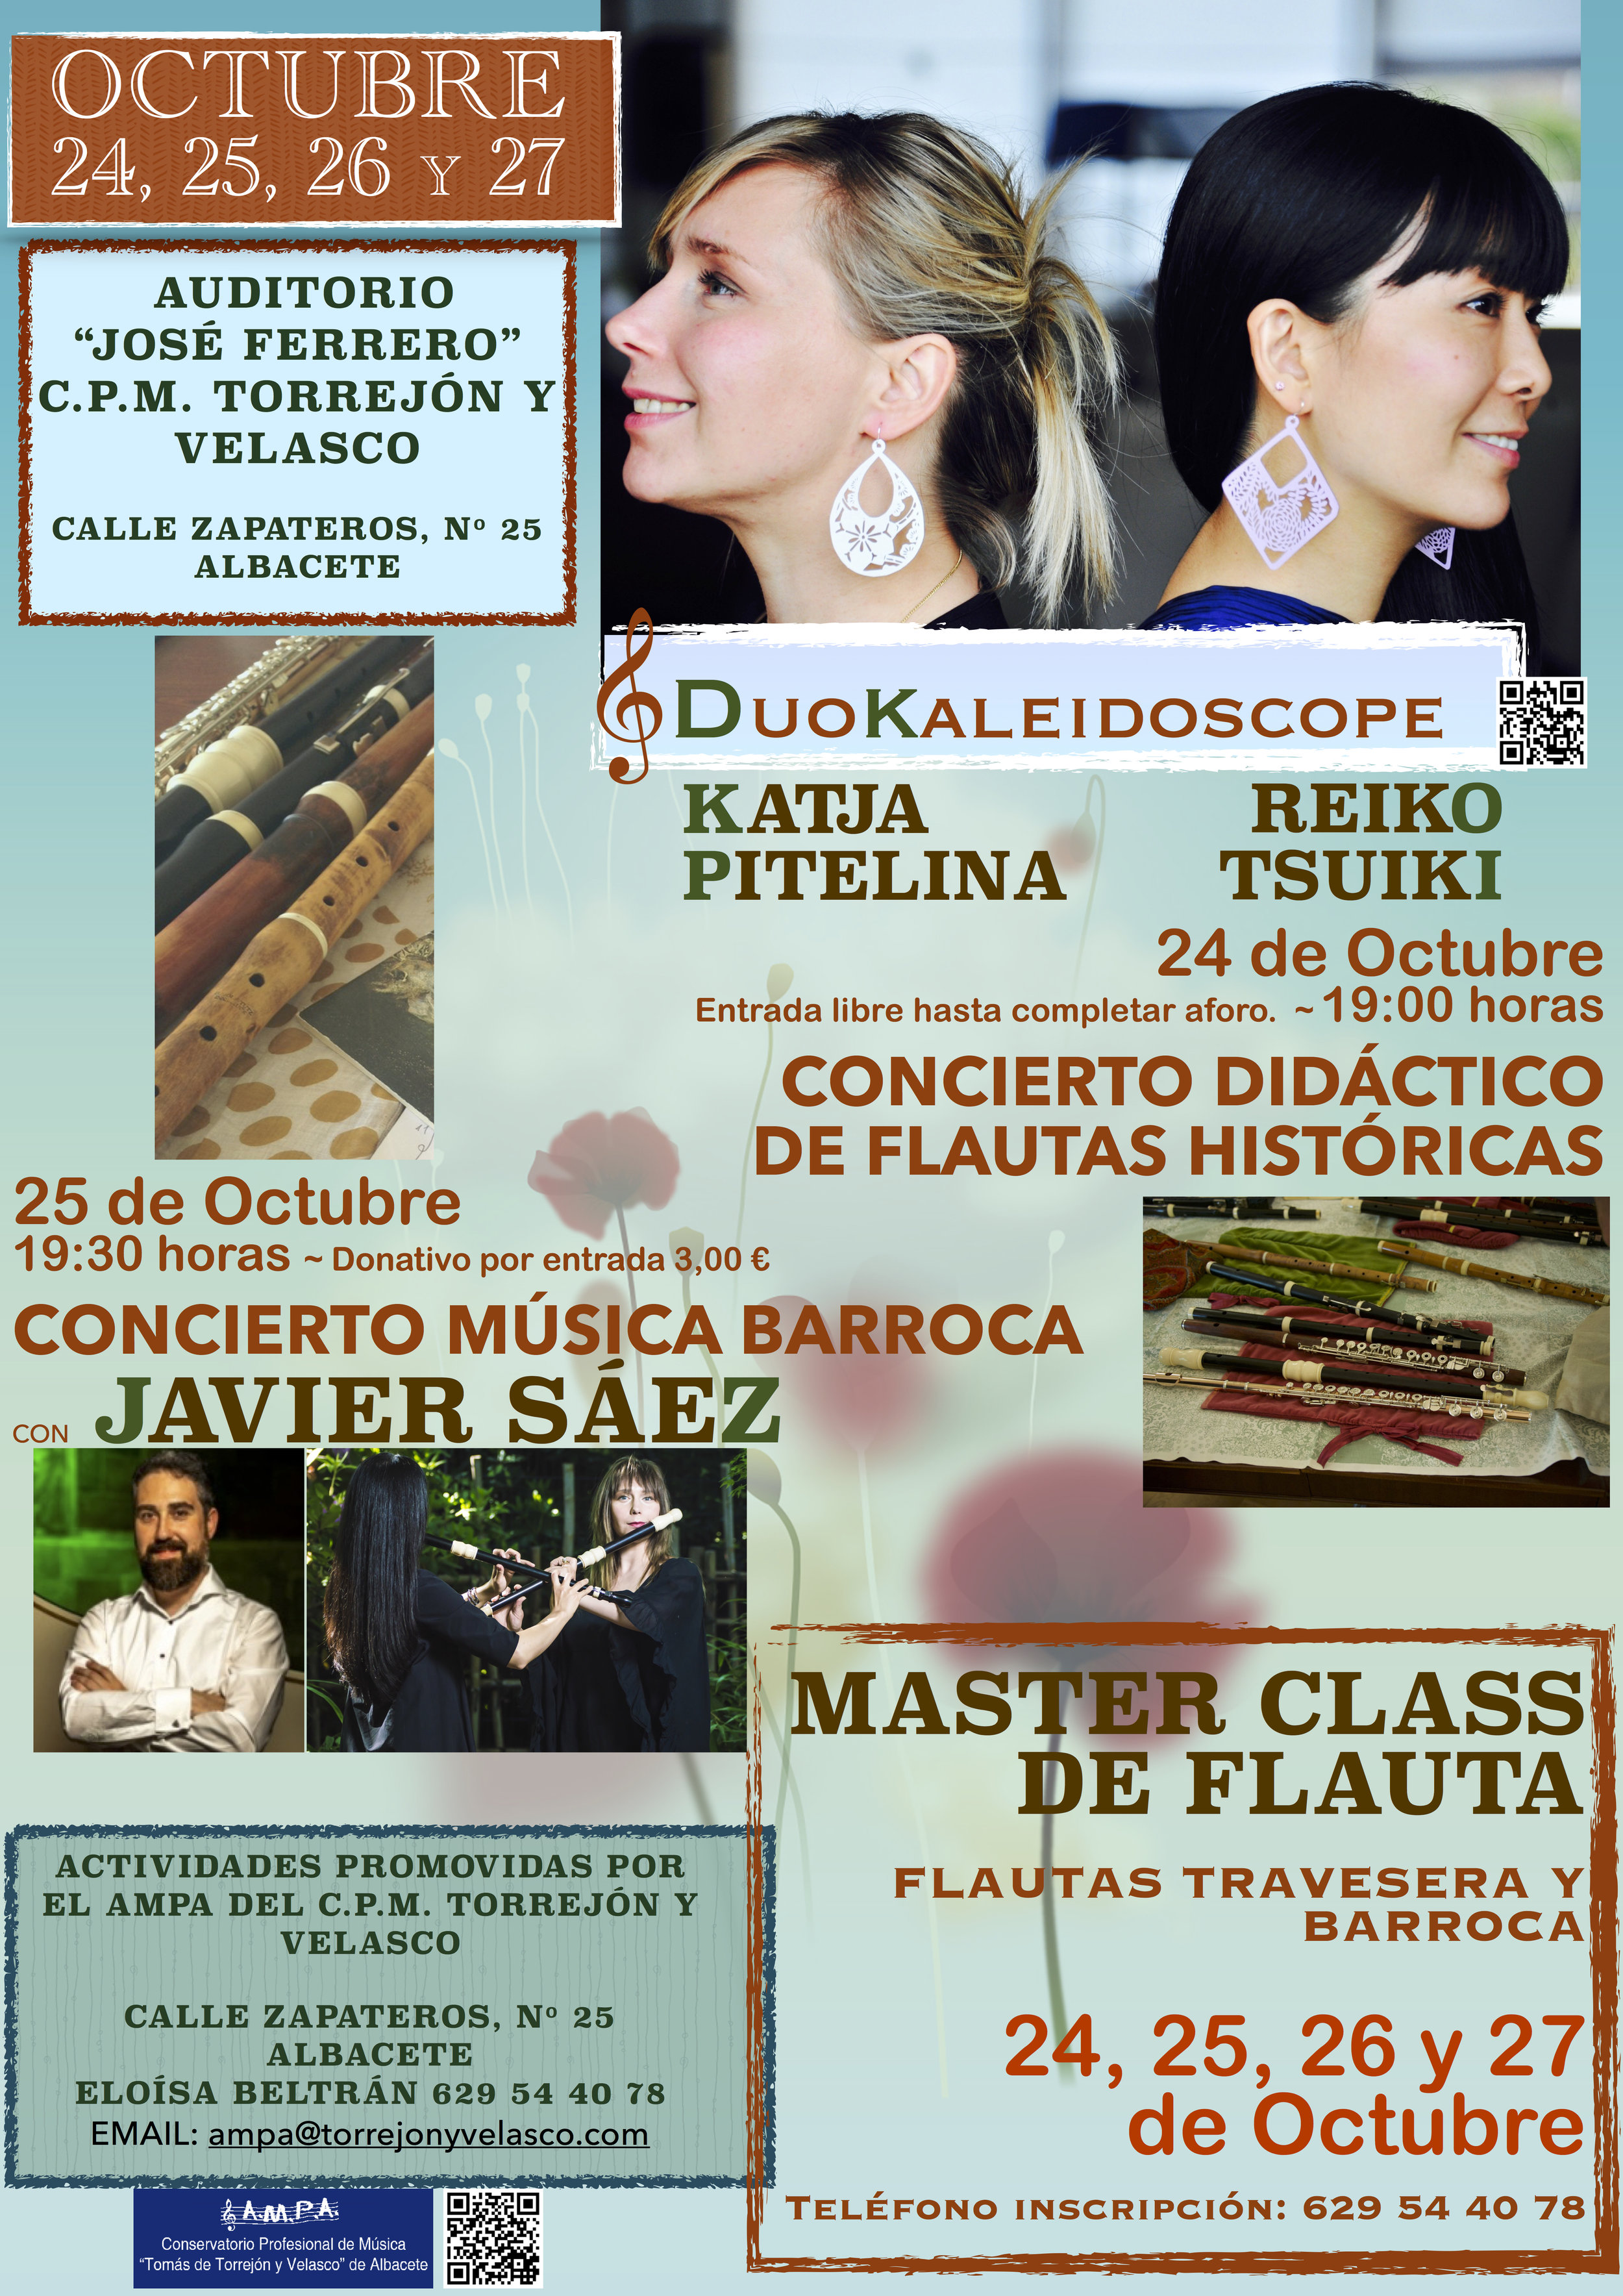 Albacete poster 1.jpg